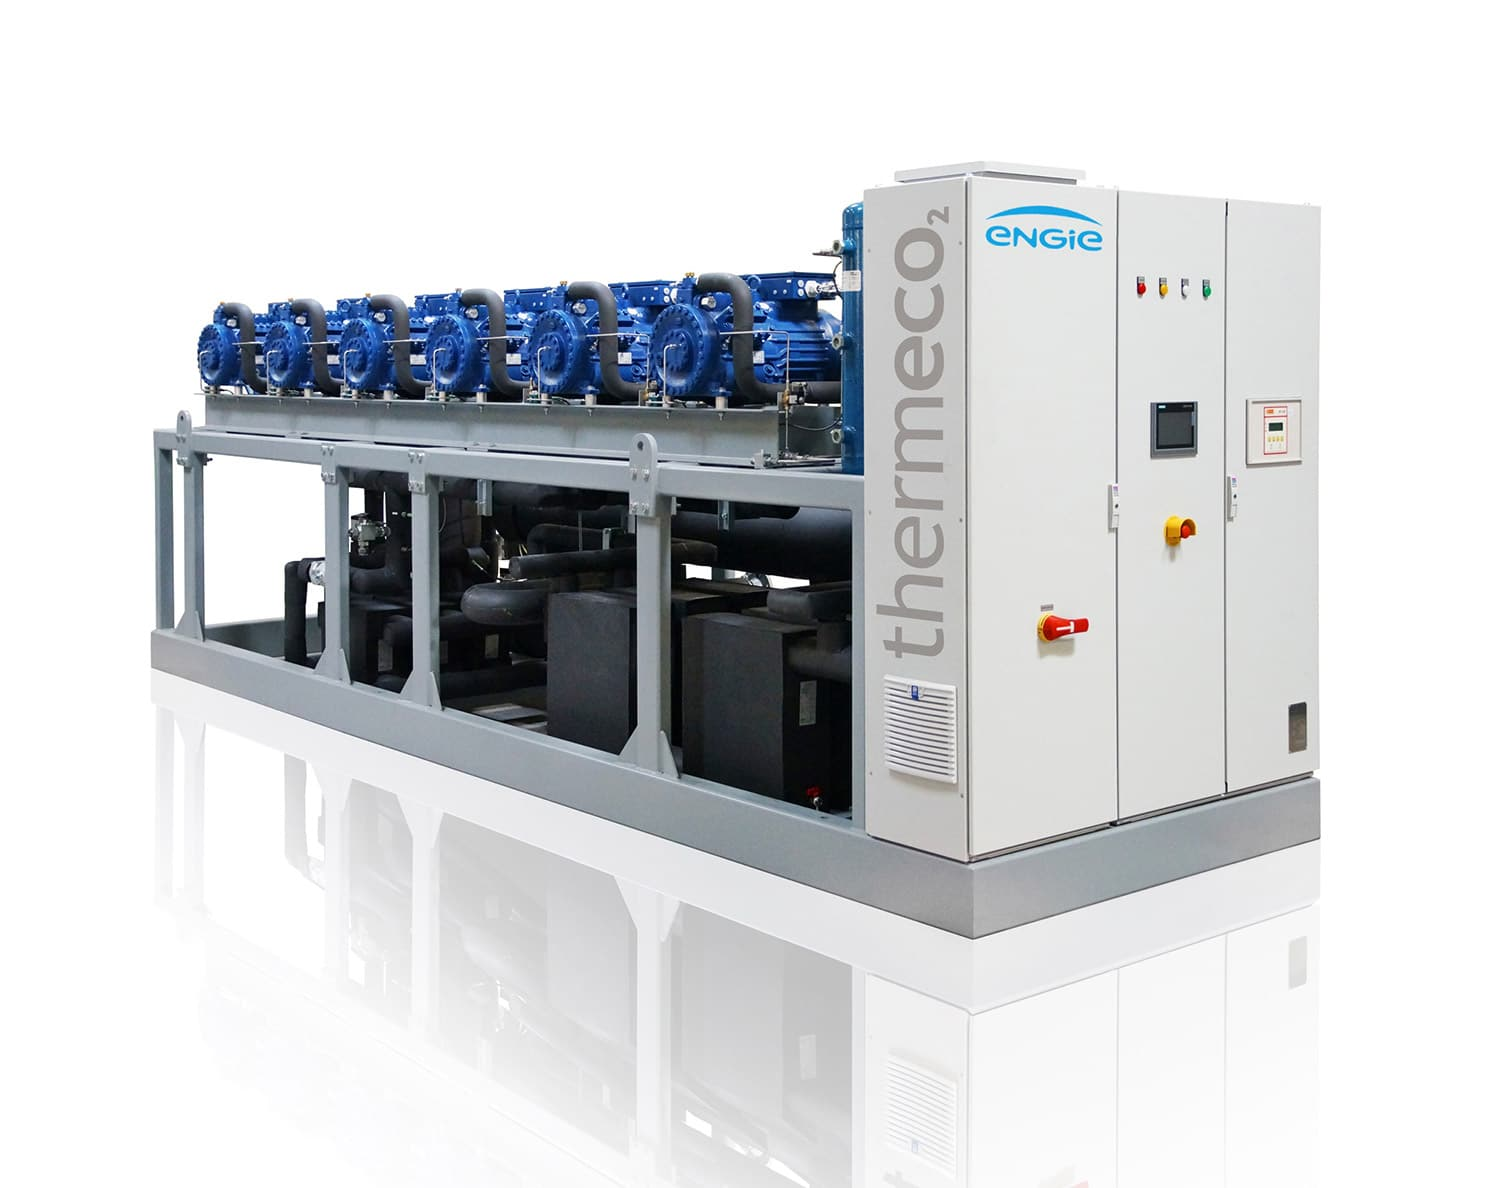 Thermeco2 high temperature heat pumps